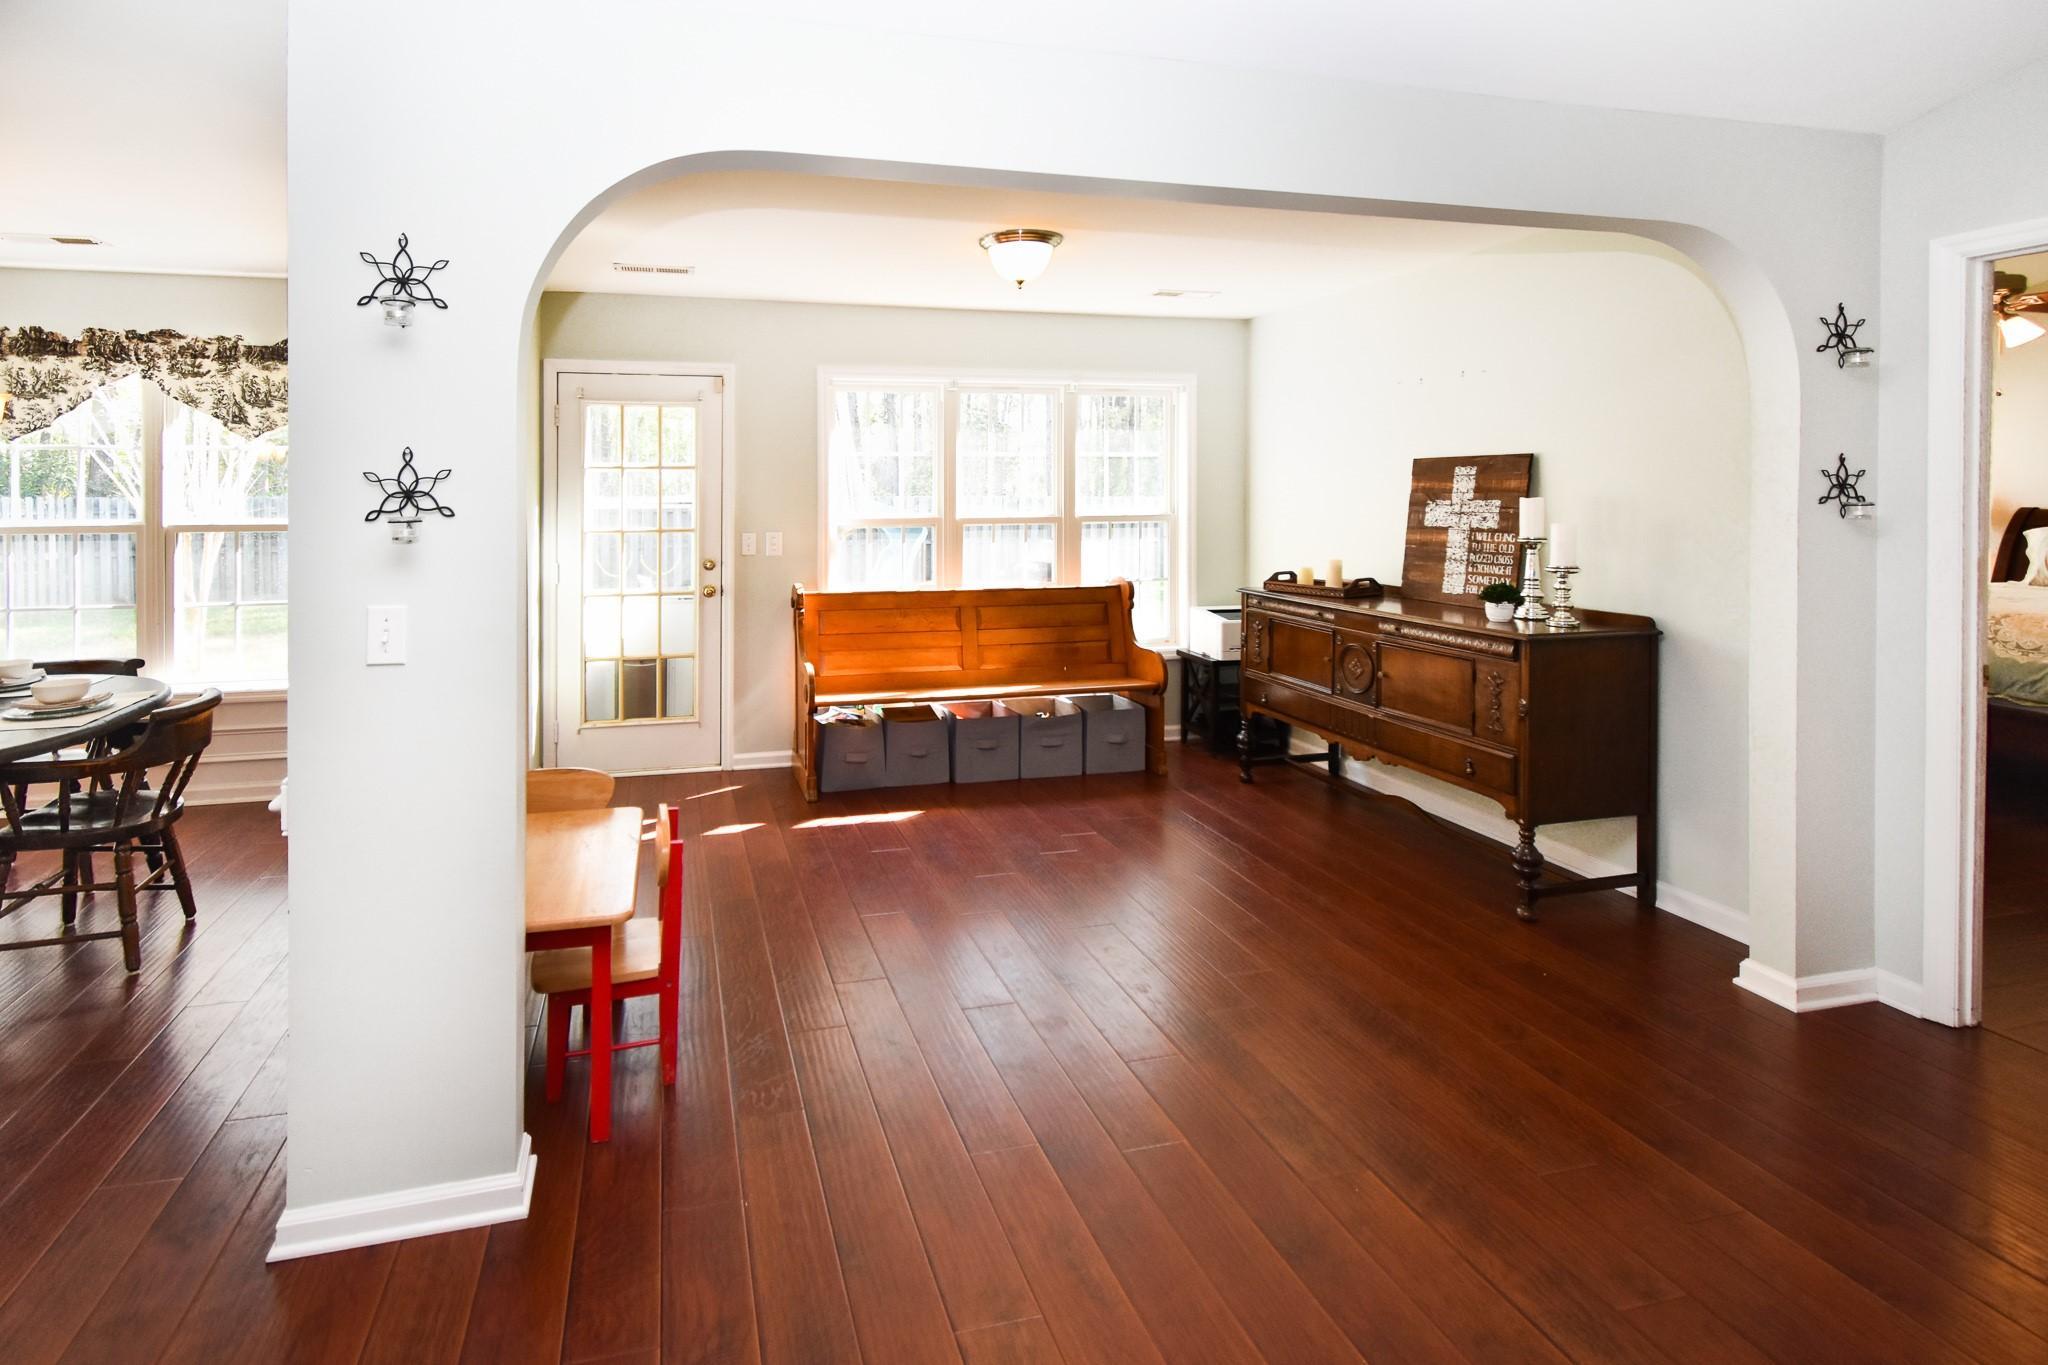 Park West Homes For Sale - 1444 Wellesley, Mount Pleasant, SC - 26